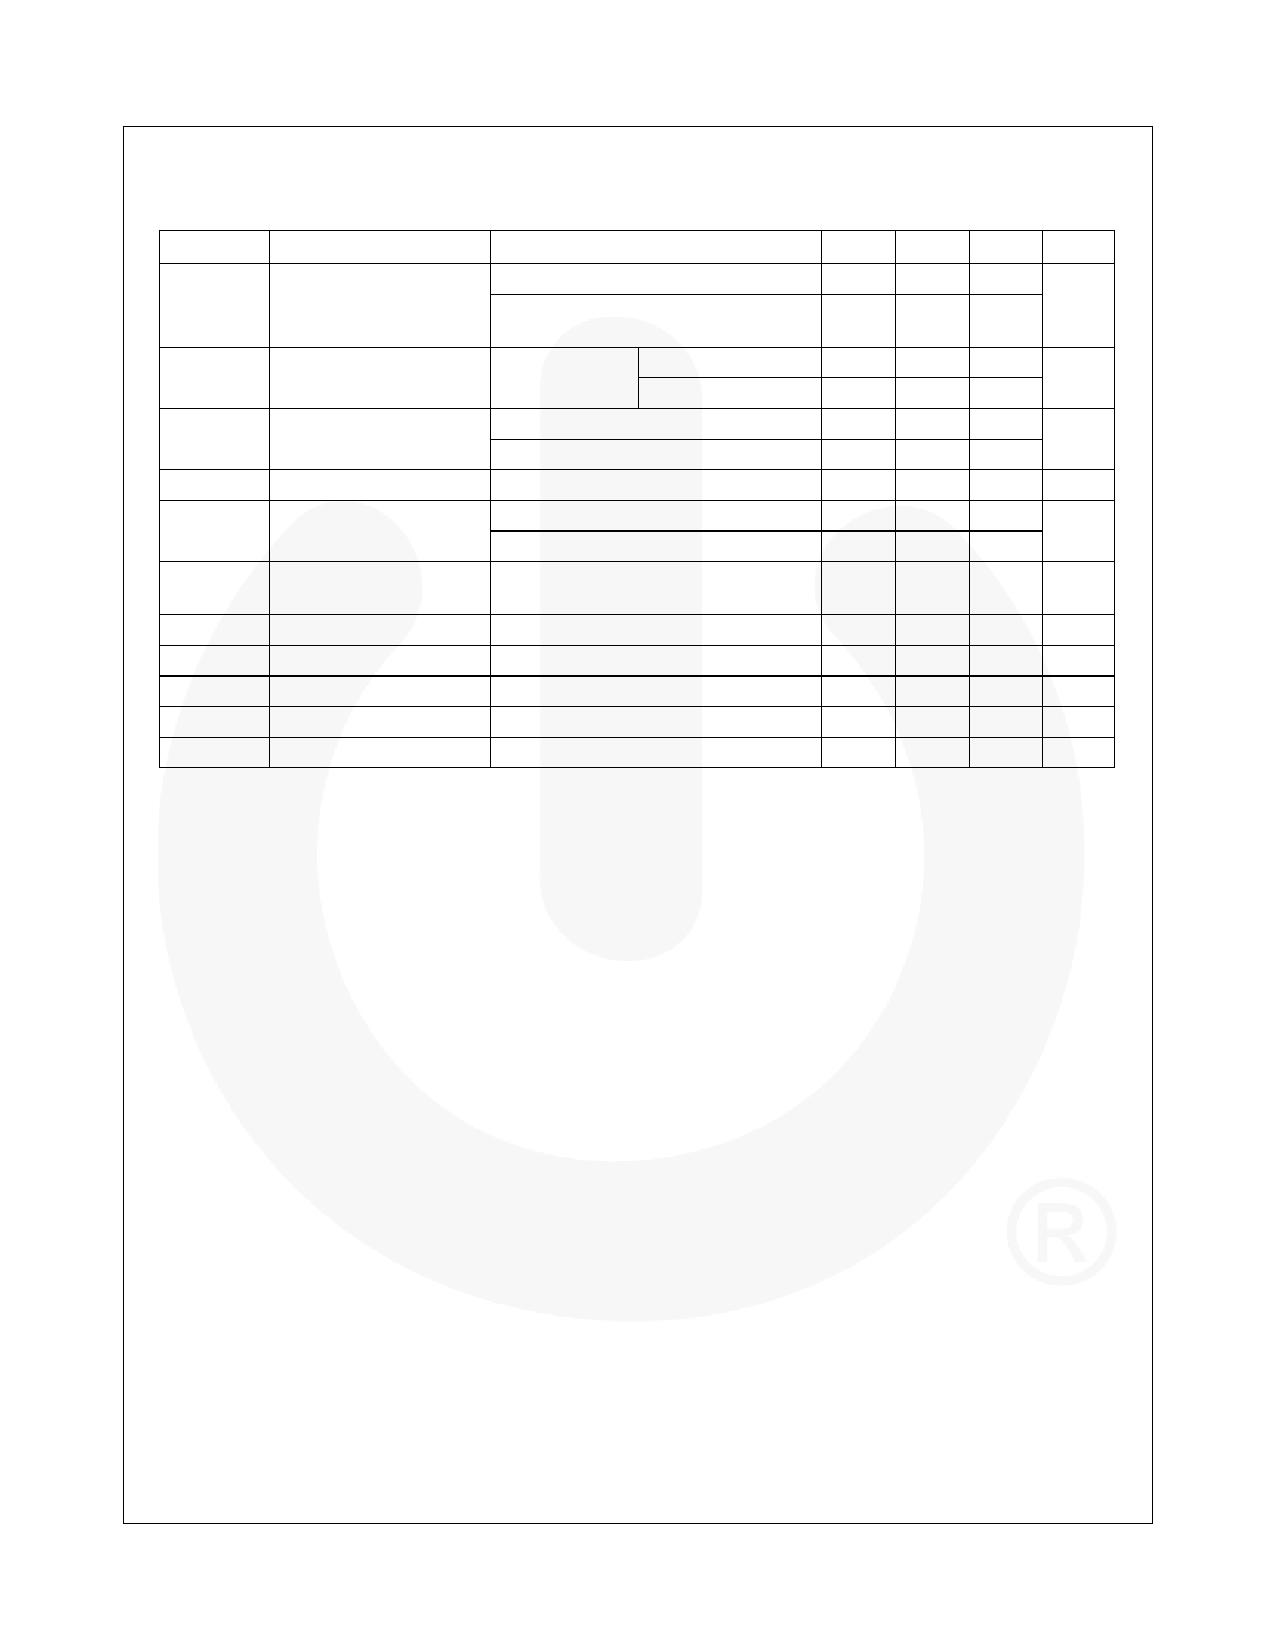 KA7915TU pdf, ピン配列